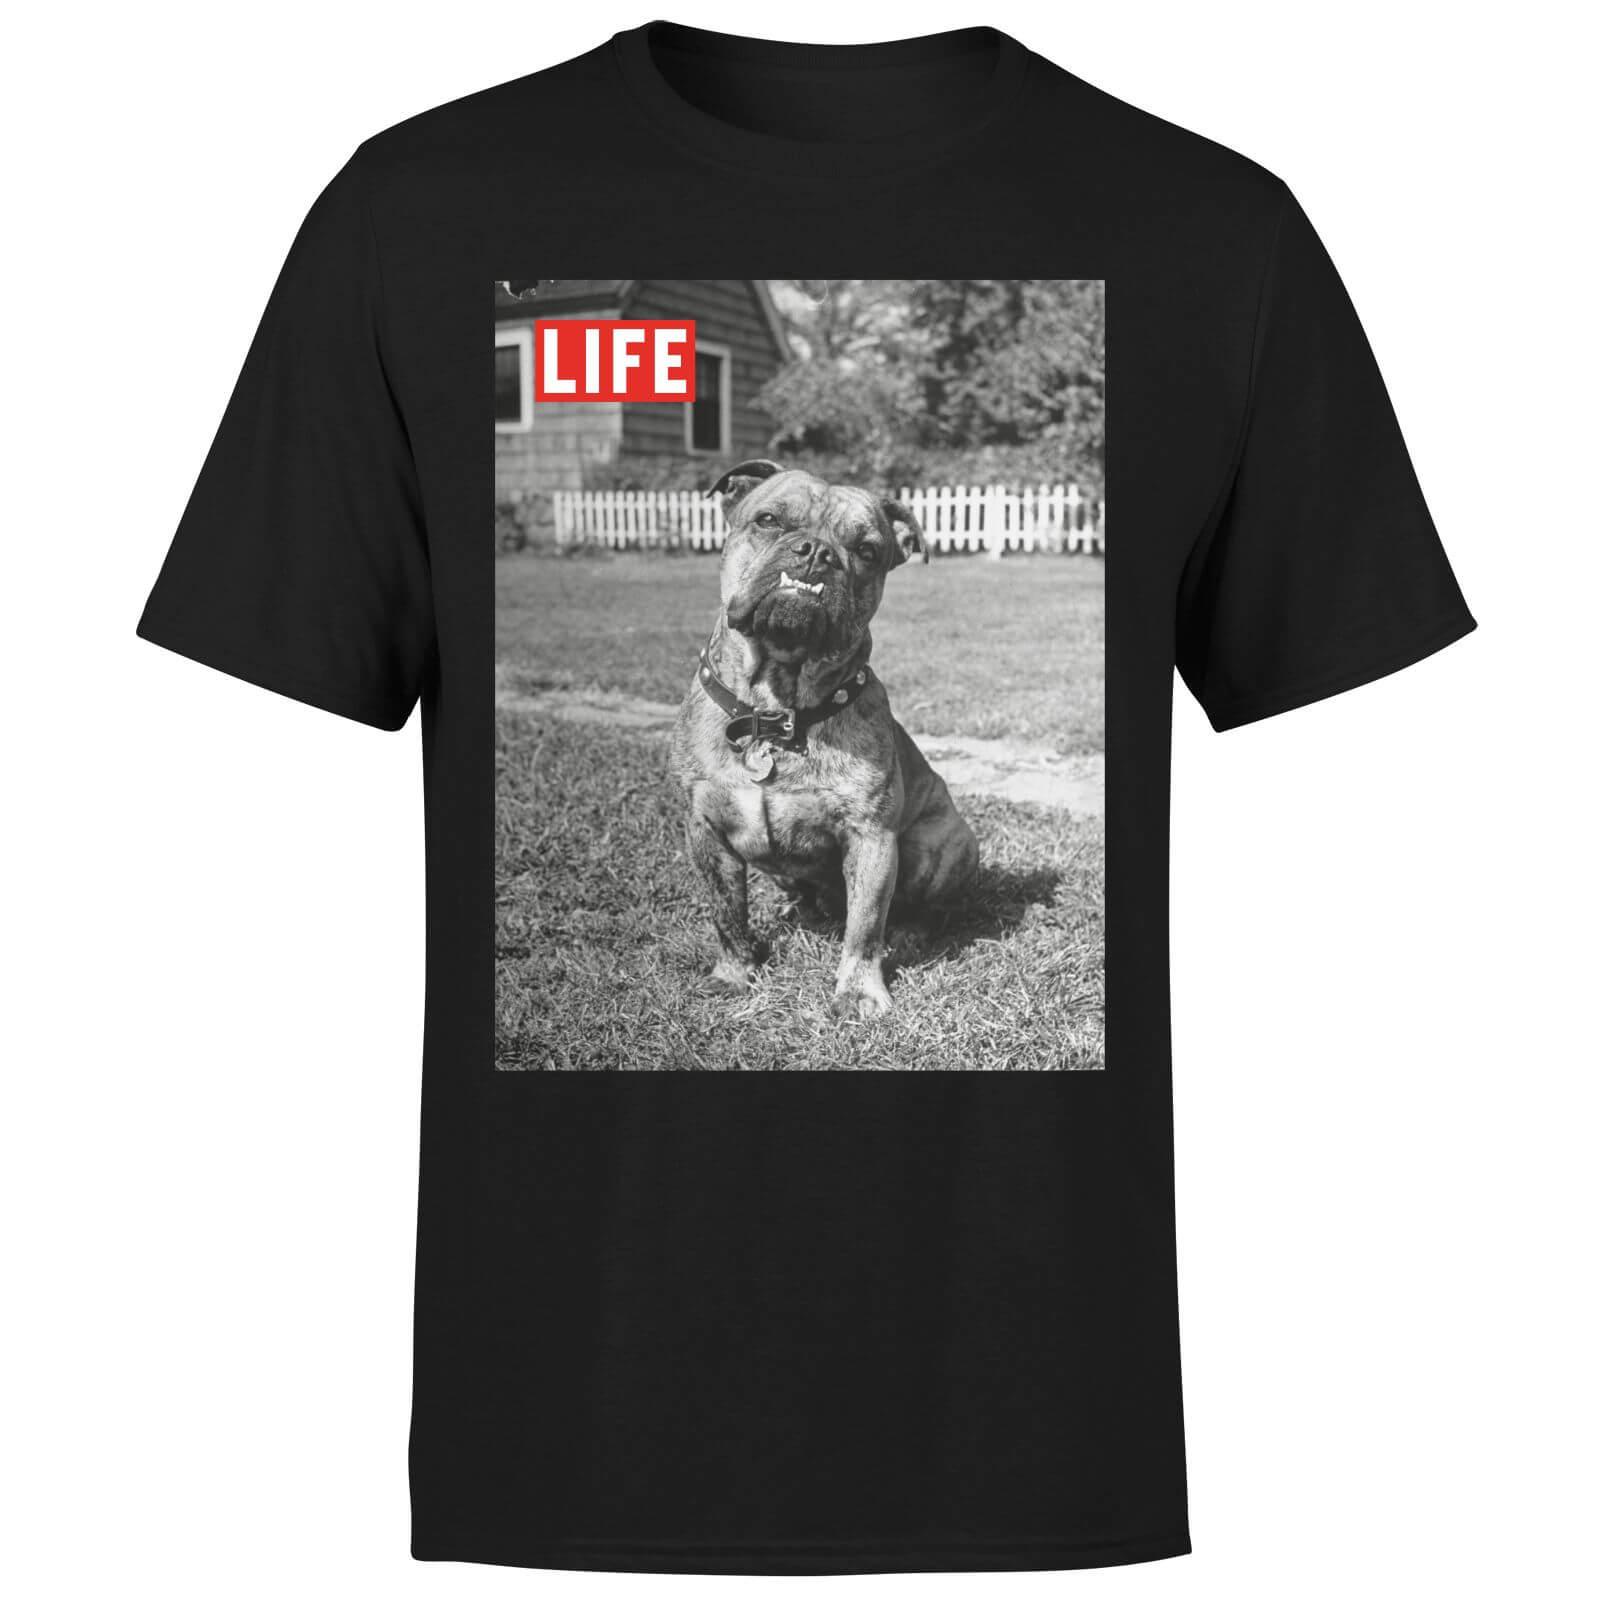 LIFE Magazine Dog Men's T-Shirt - Black - XL - Black-male